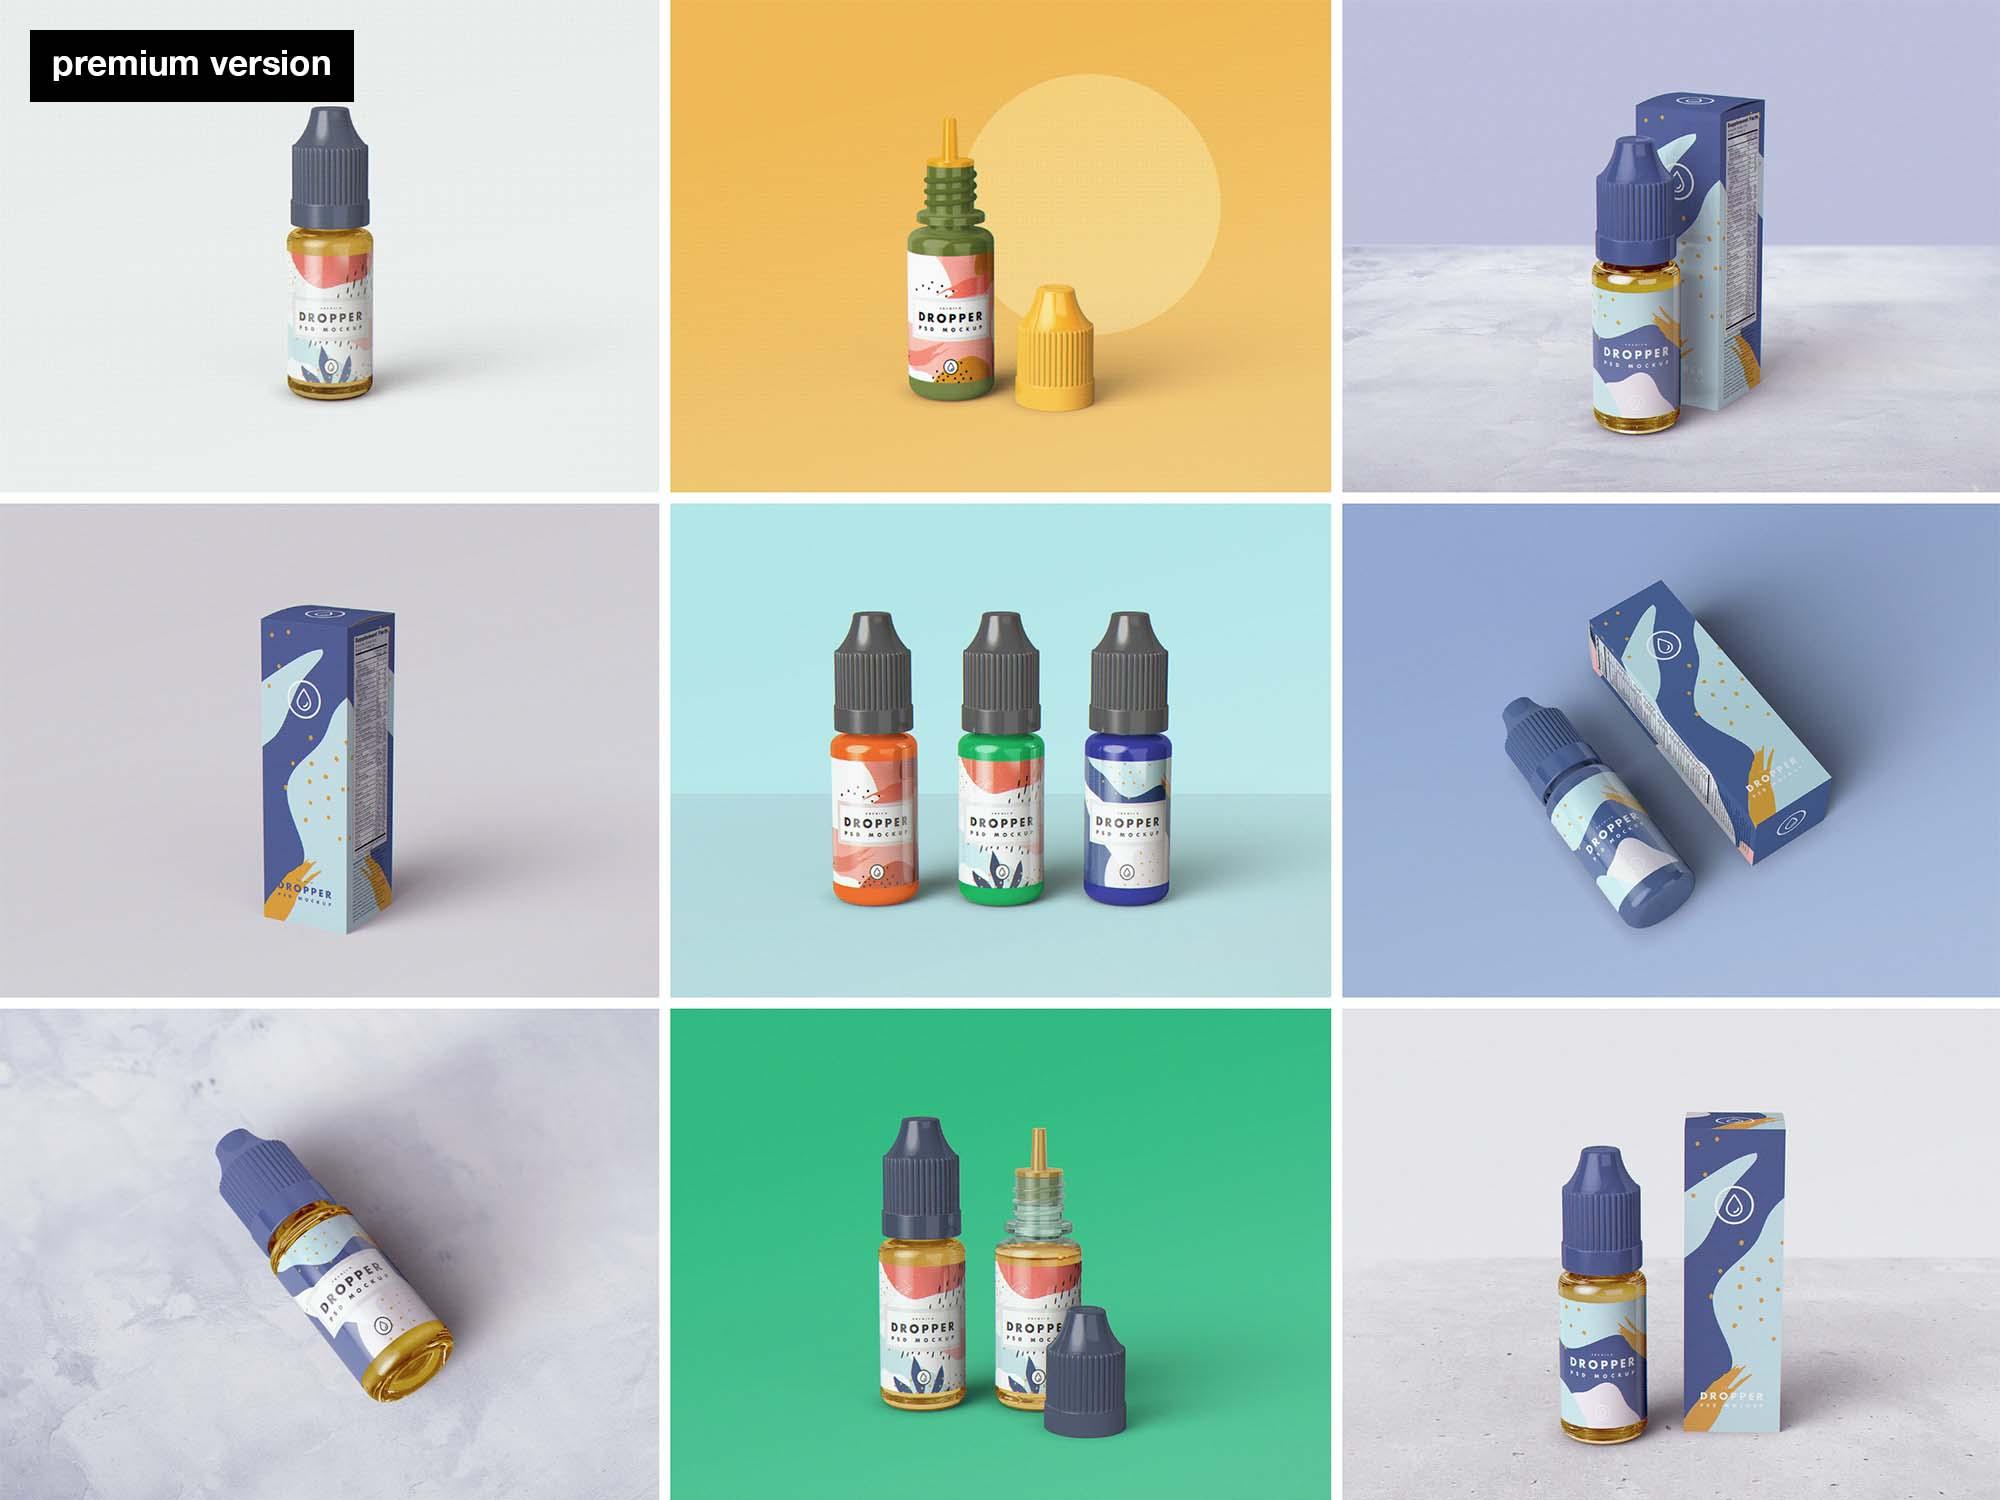 E-Juice Dropper Bottle Mockup - Premium Version